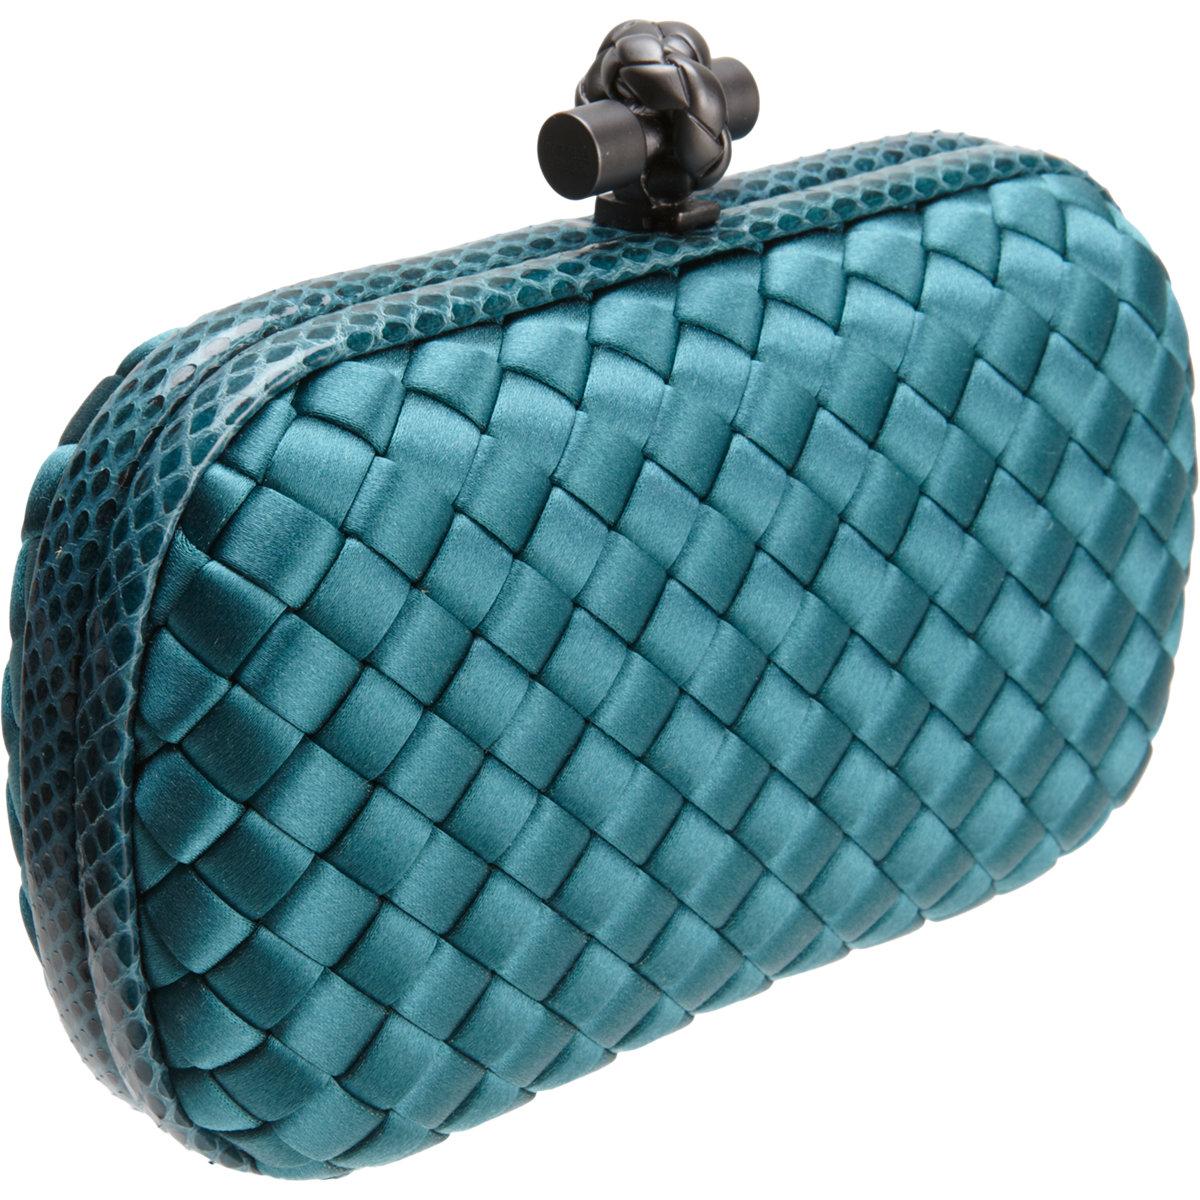 cdef640ffc Bottega Veneta Knot Intrecciato Satinsnakeskin Clutch in Blue - Lyst